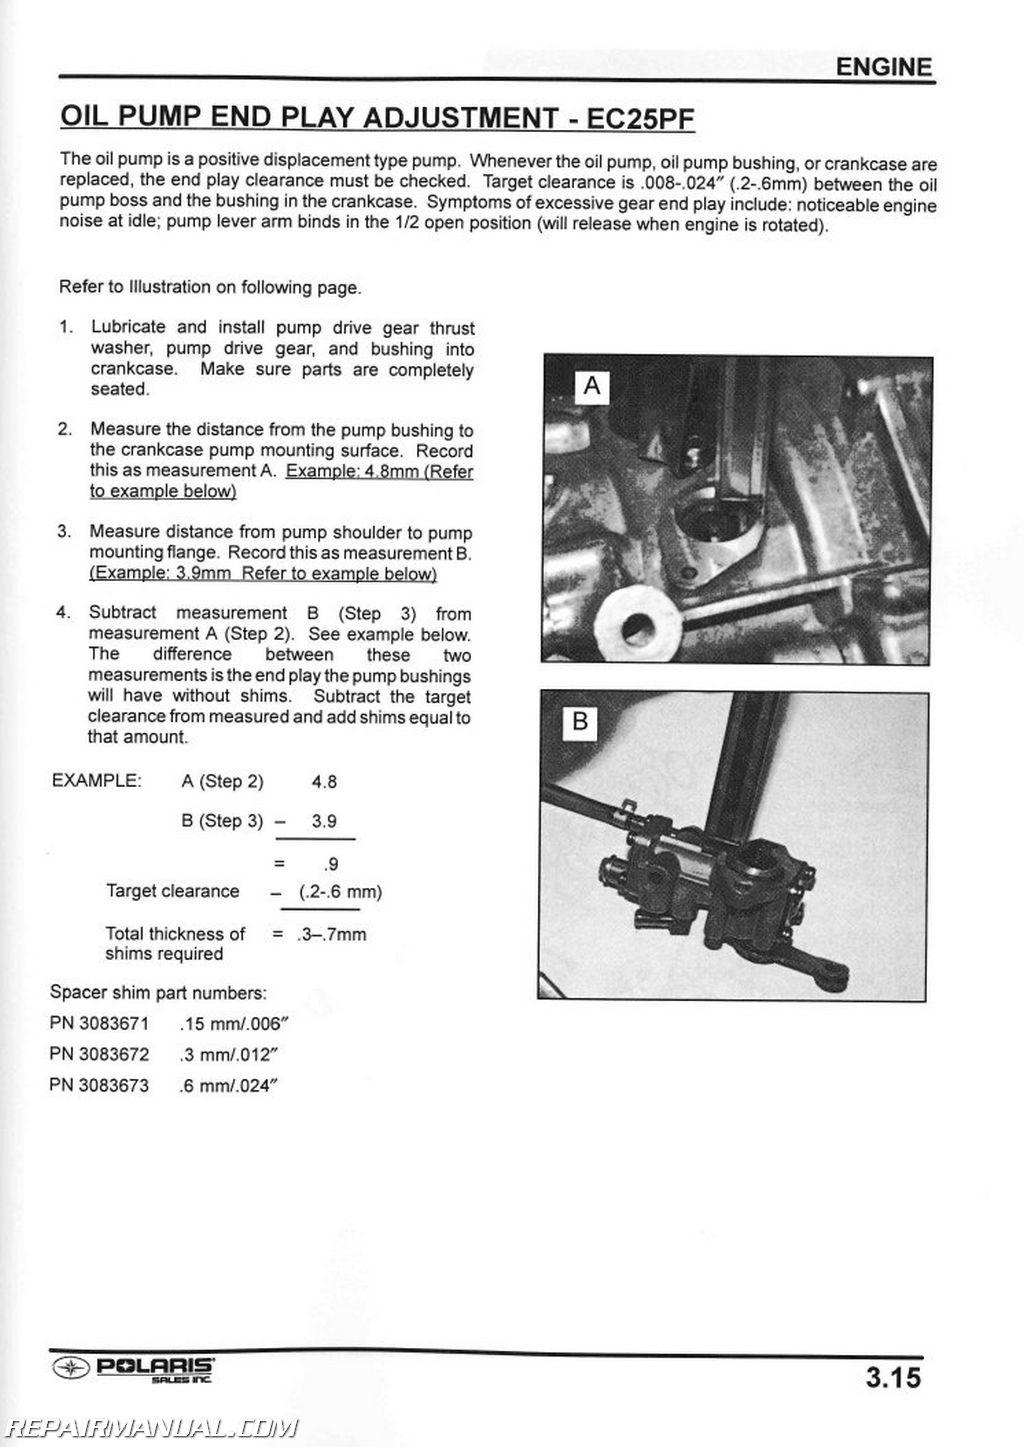 2000 polaris xplorer 250 400 atv service manual rh repairmanual com service manual for 2000 polaris magnum 325 service manual for 2000 polaris trail boss 325